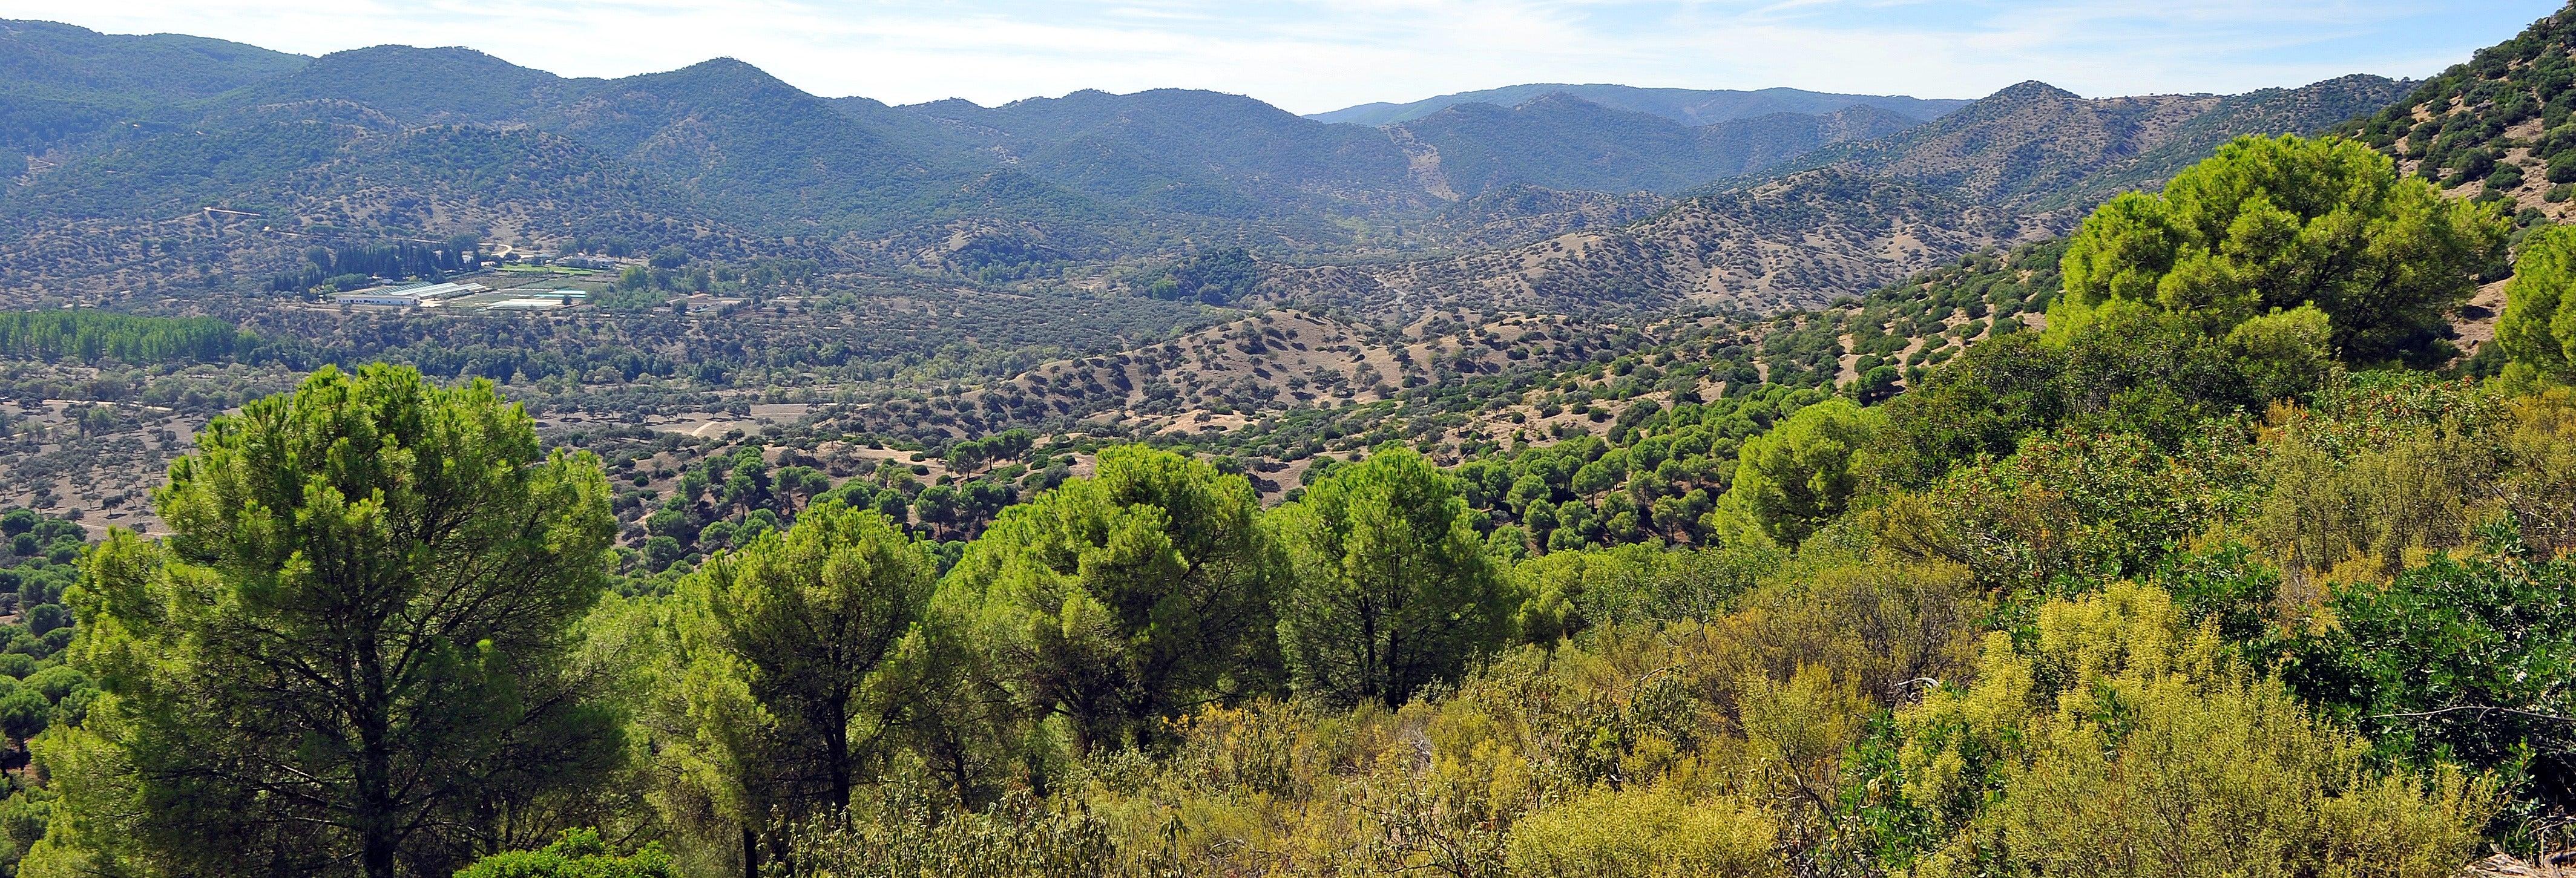 Tour en 4x4 por la Sierra de Andújar